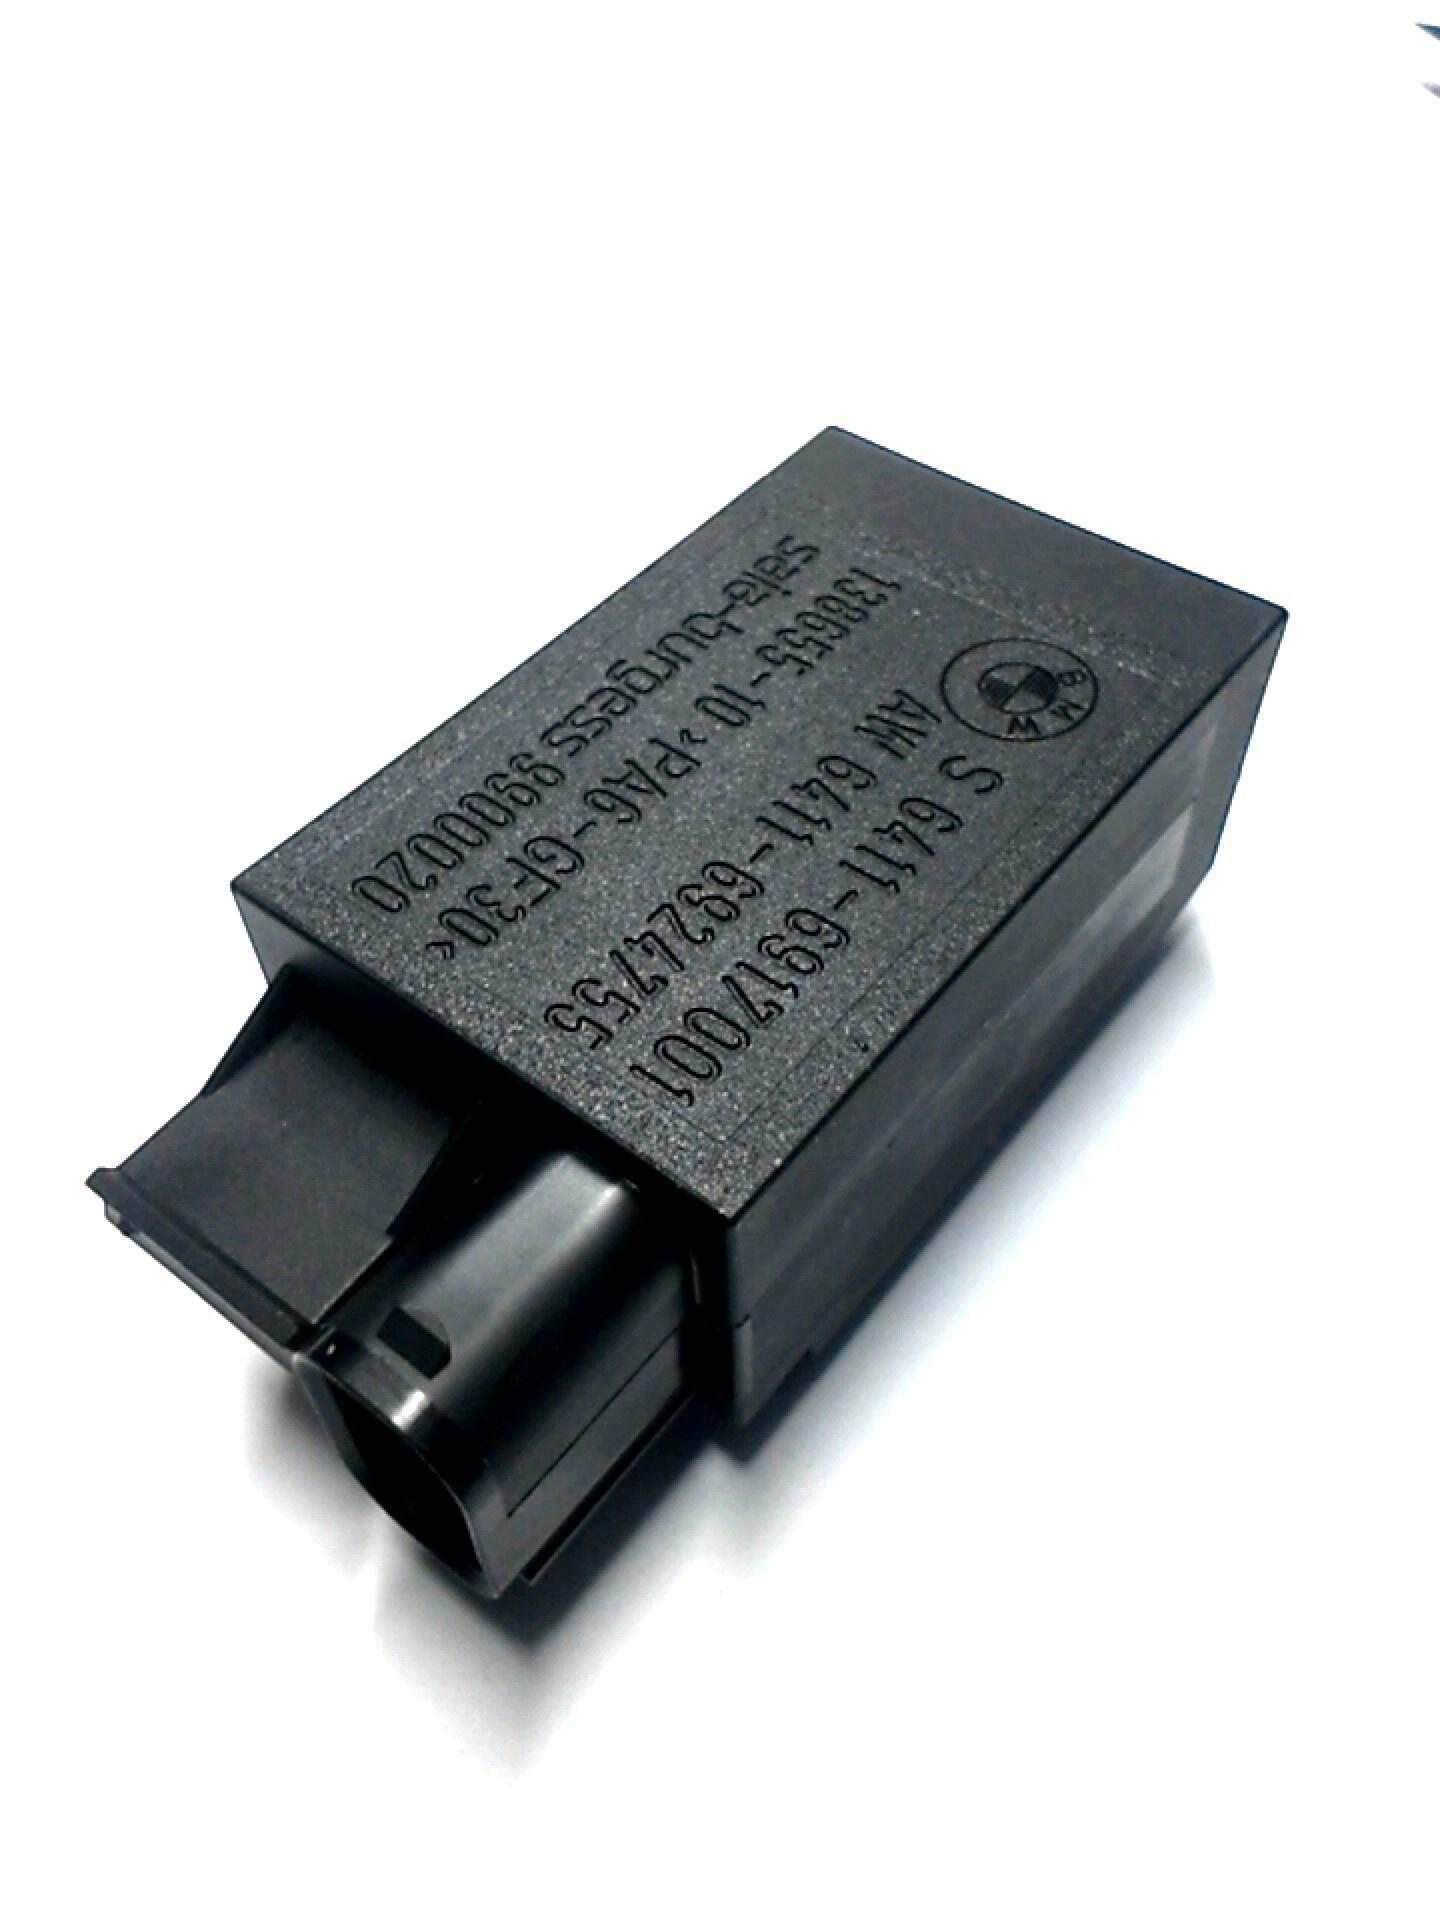 bmw 325ci sensor f auc yes small actuators. Black Bedroom Furniture Sets. Home Design Ideas